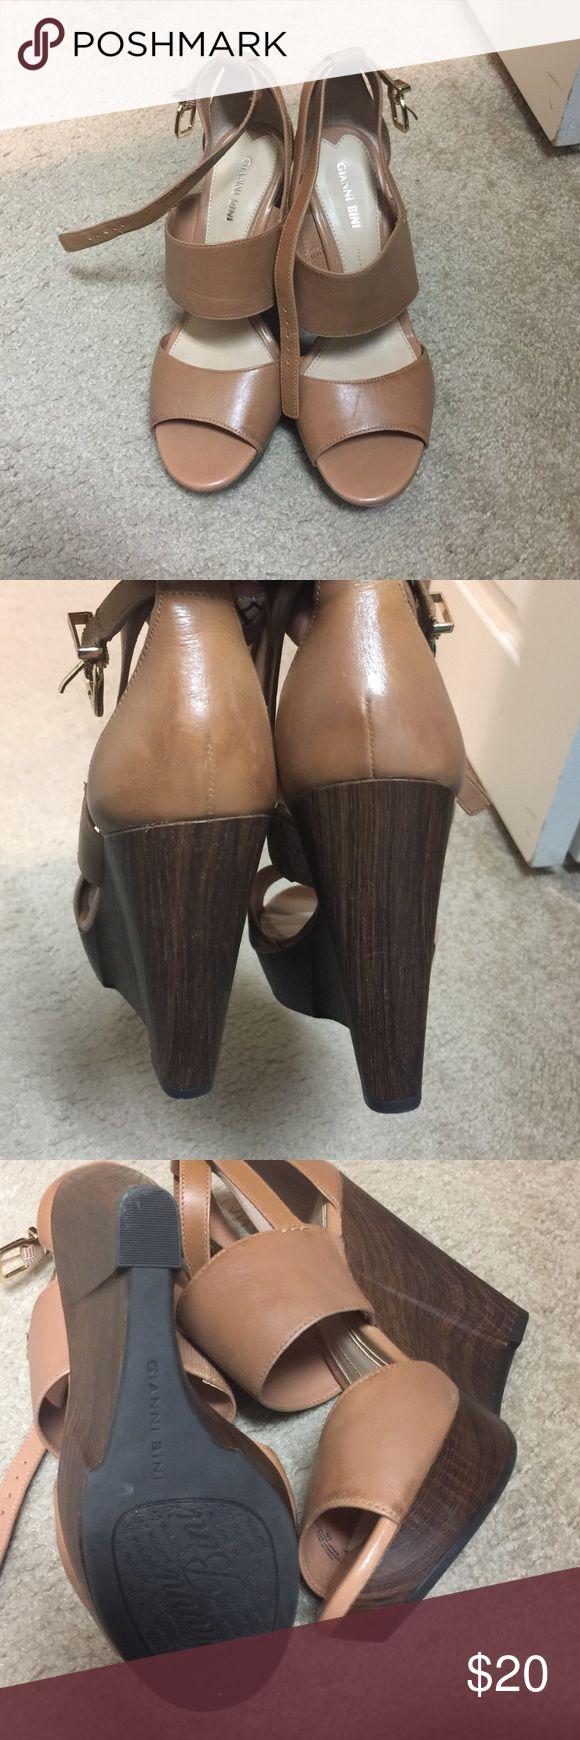 Gianni Bini NWOT Gianni Bini Wedges, love these shoes, never been worn as seen in the photos. Gianni Bini Shoes Wedges